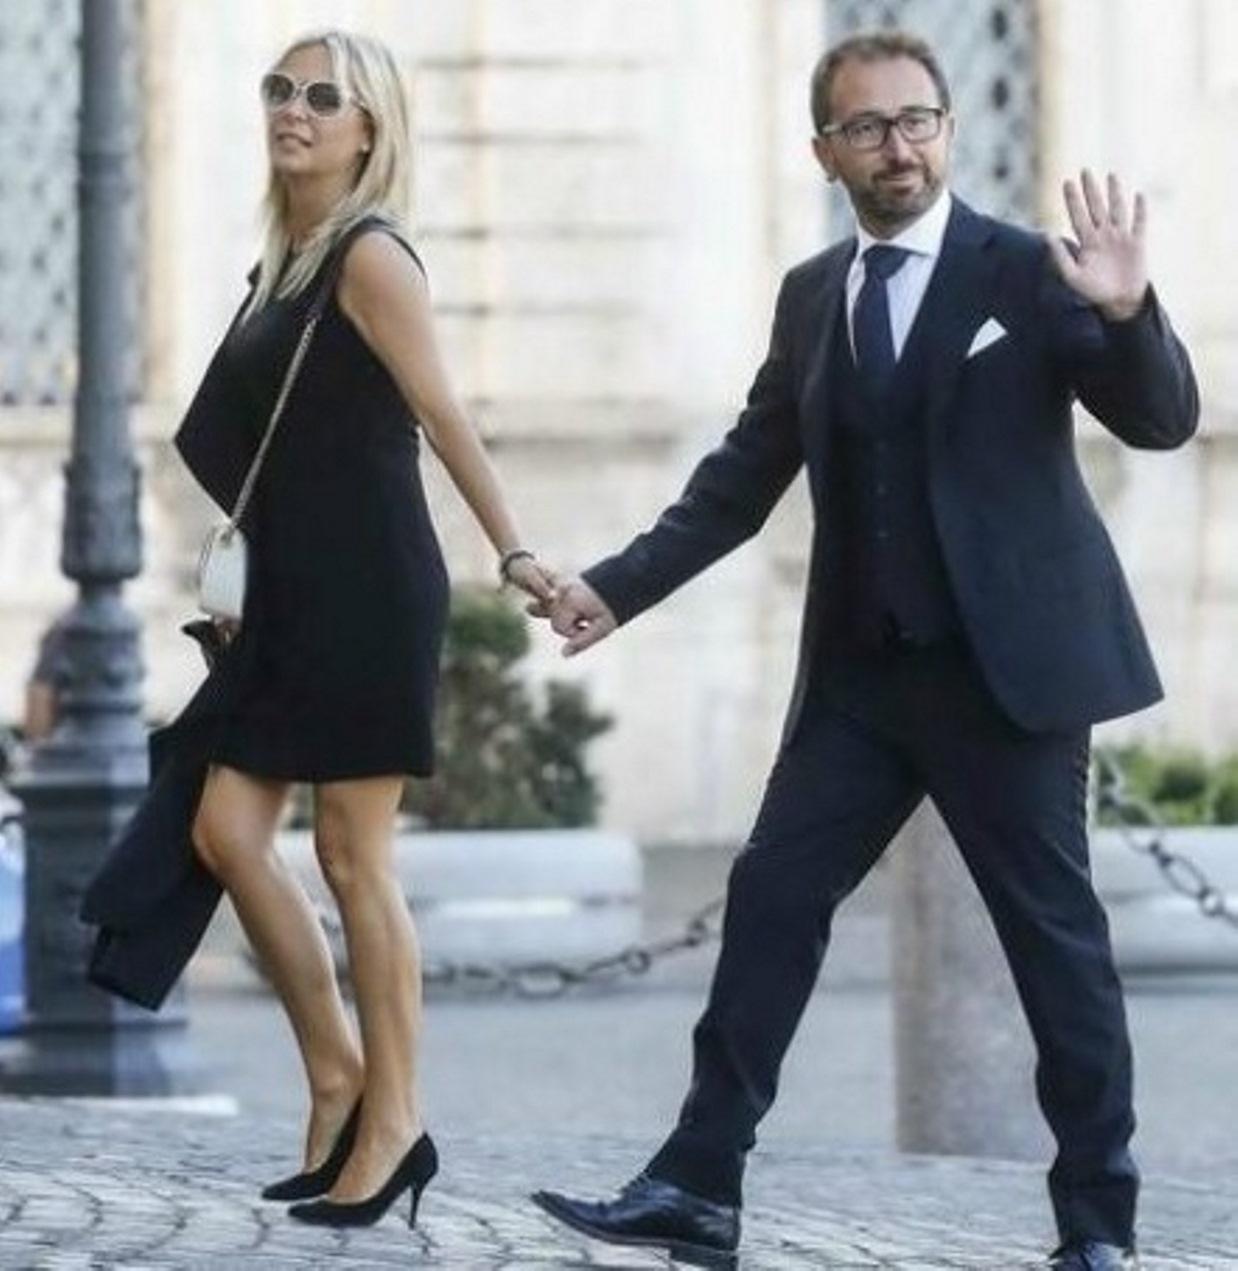 alfonso bonafede matrimonio invitati